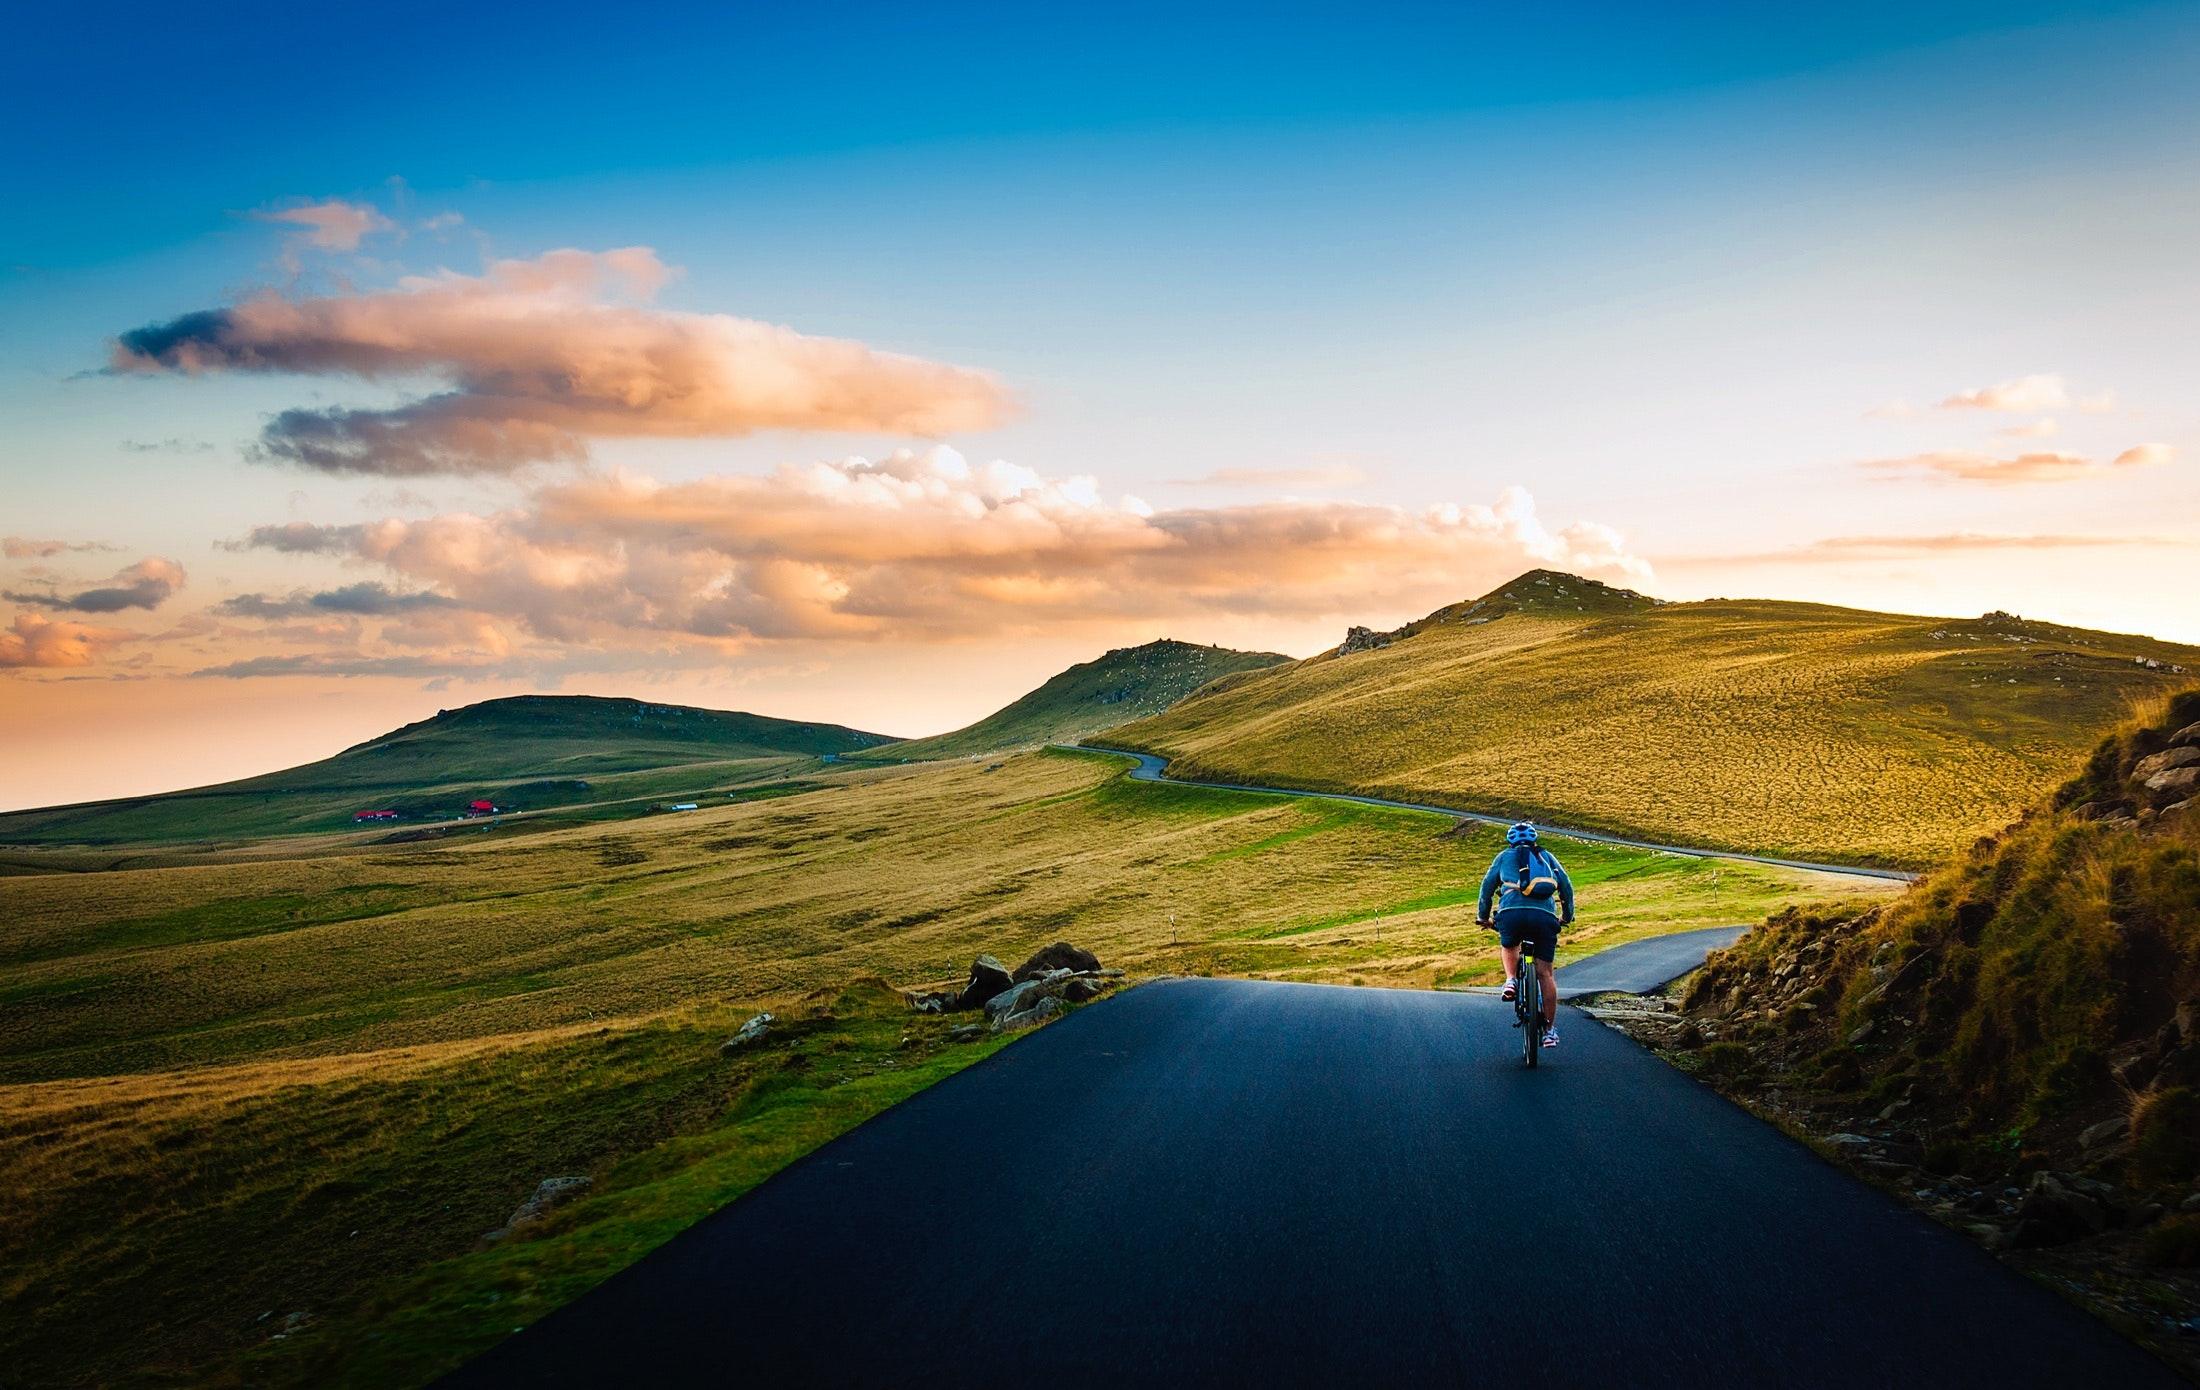 Impact Coronavirus is Having on Cycling